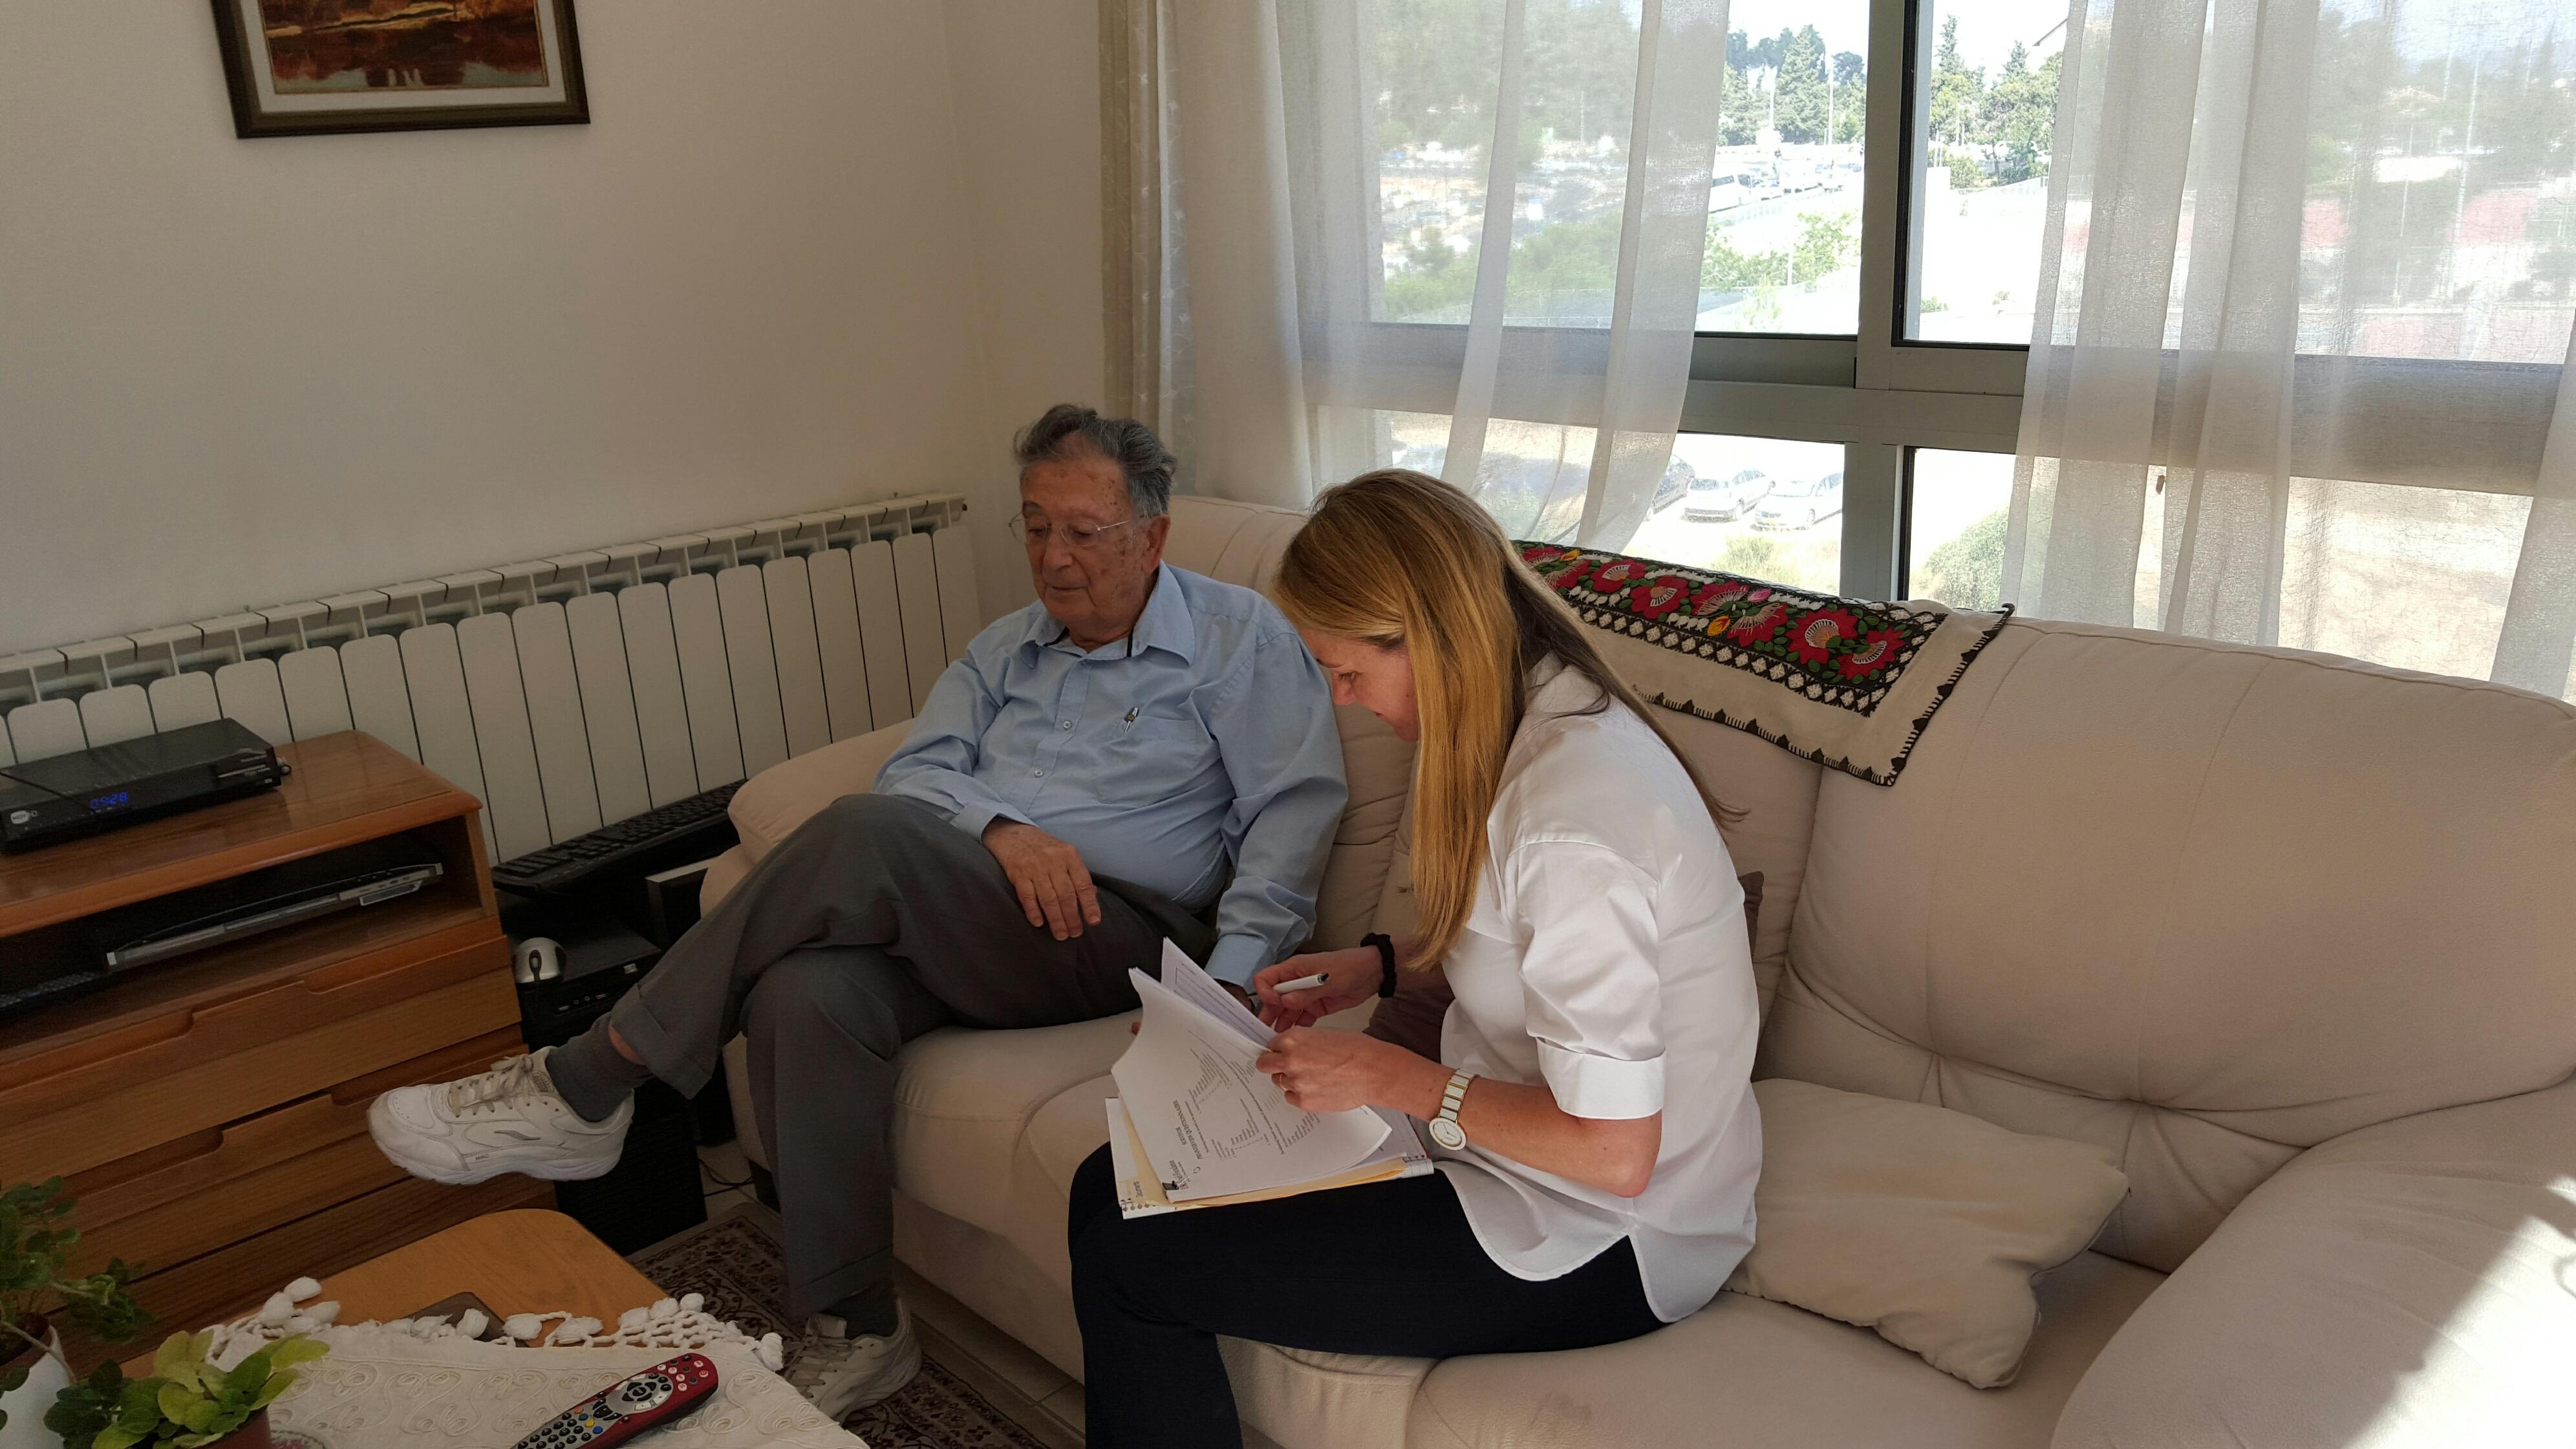 Karen Jungblut interviews Yehuda Bauer in Jerusalem, June 29, 2015